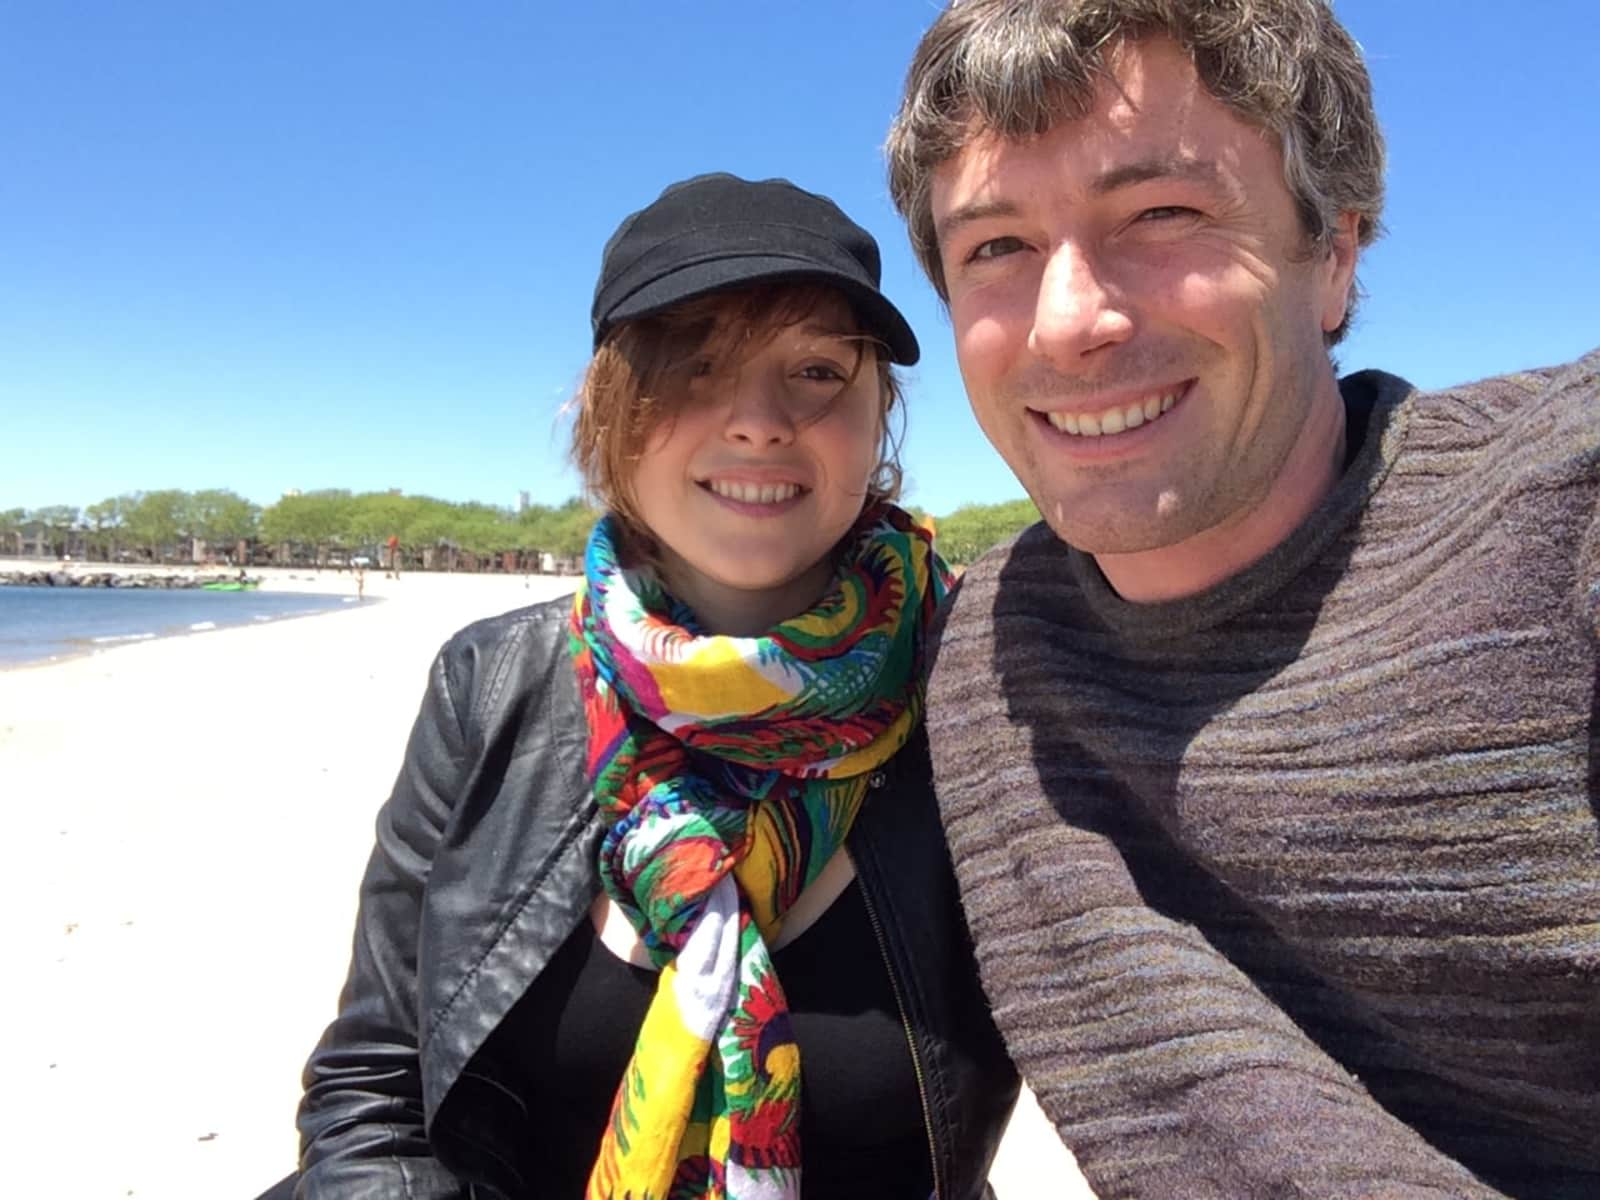 Andrea & Tristan from Toronto, Ontario, Canada